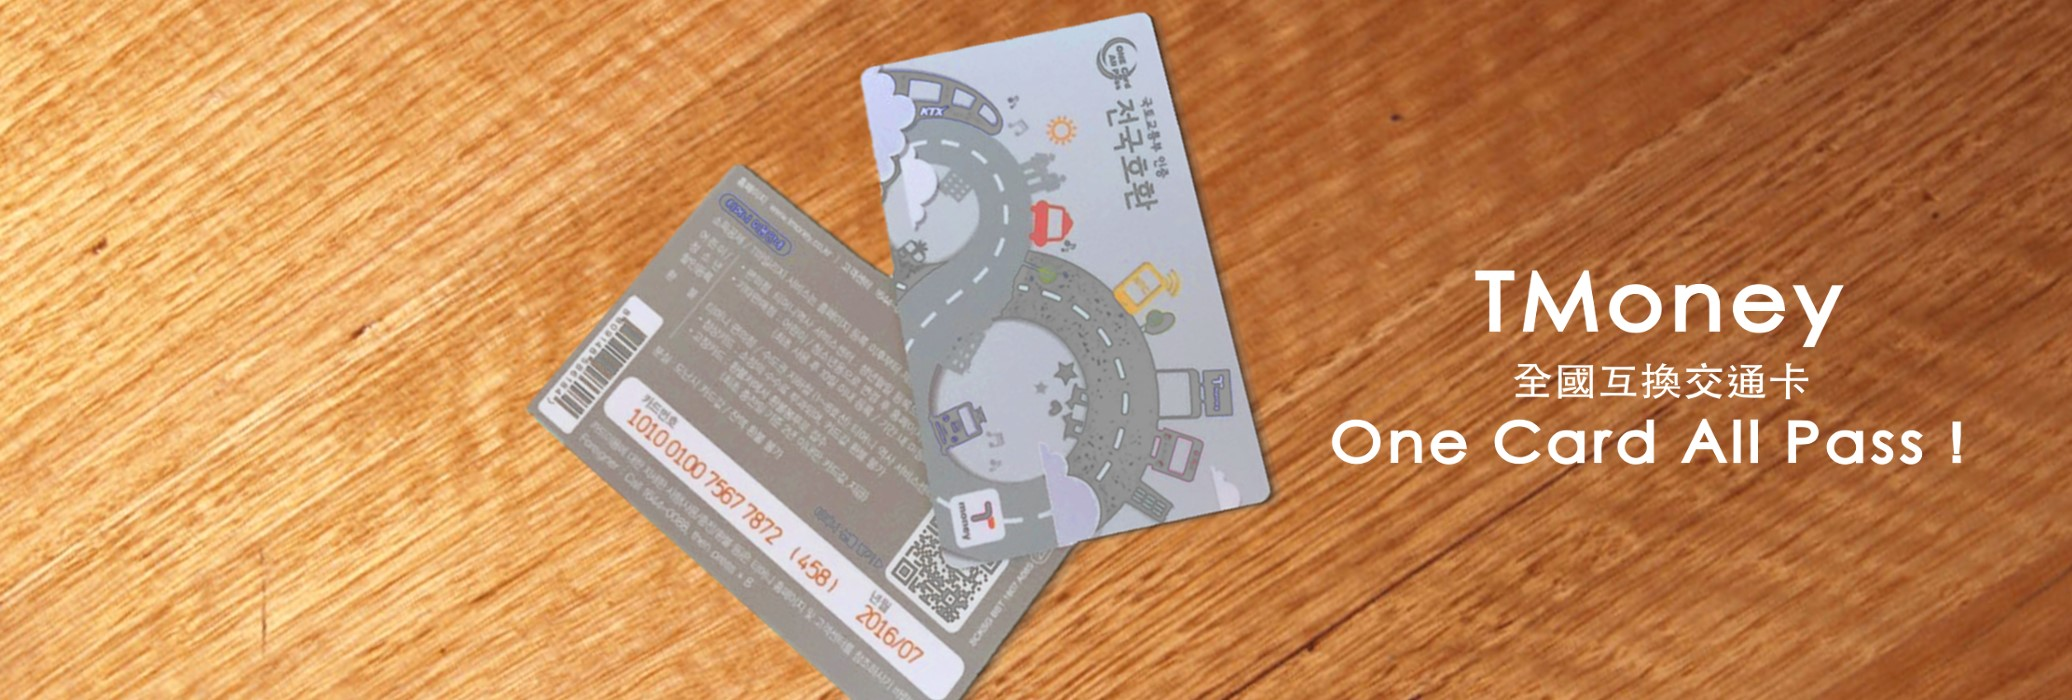 【韓國自由行必備】T-money Card 交通卡-KKday.com